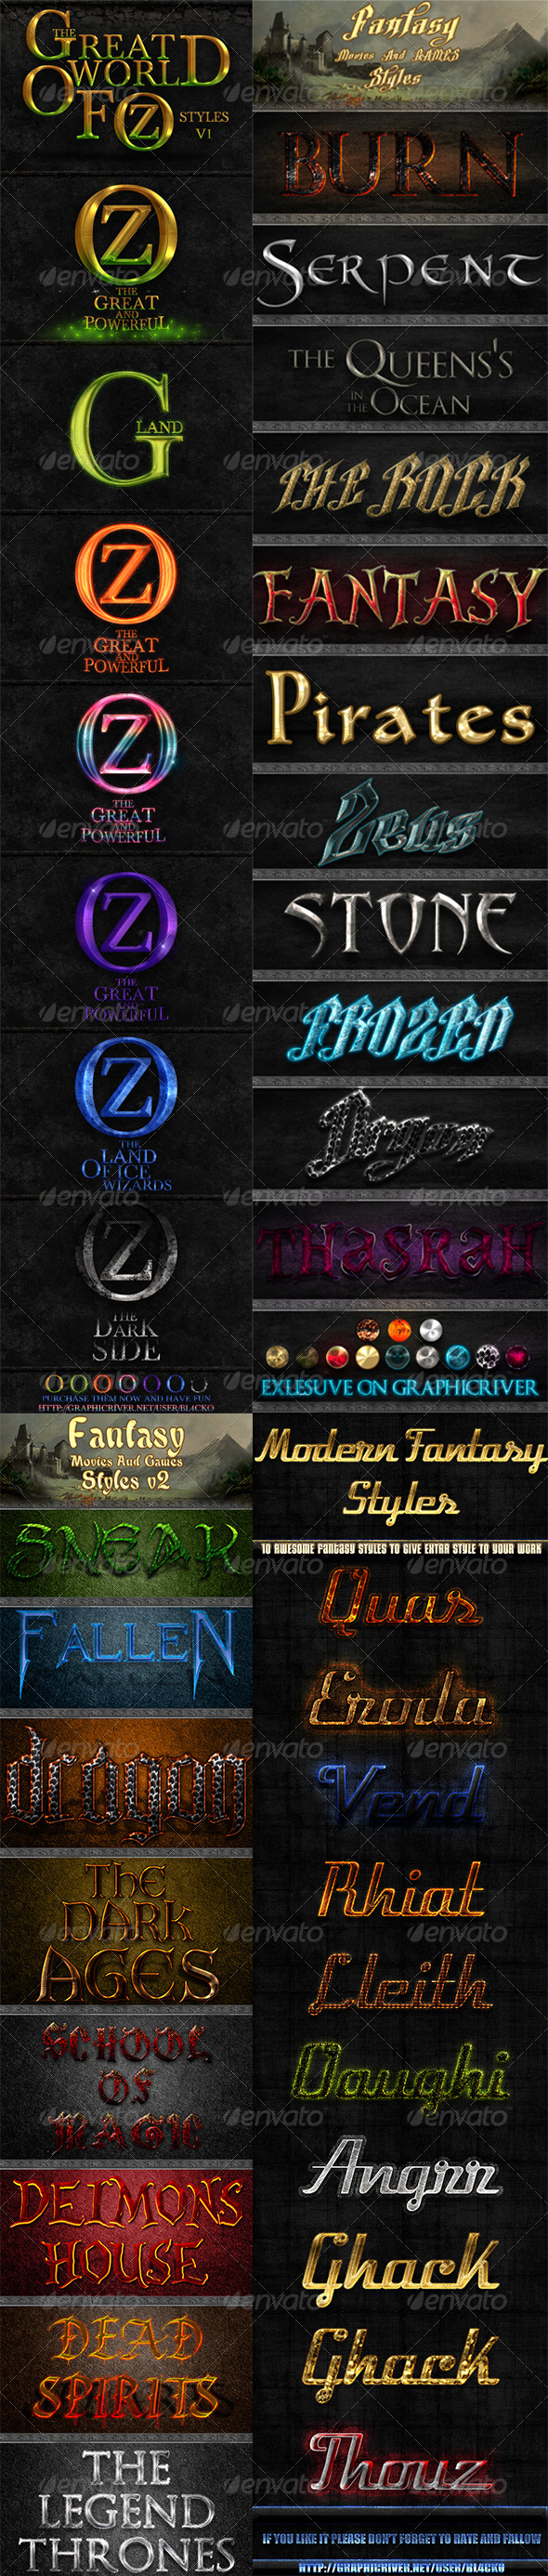 GraphicRiver 35 Fantasy Photoshop Styles Bundle 5177011